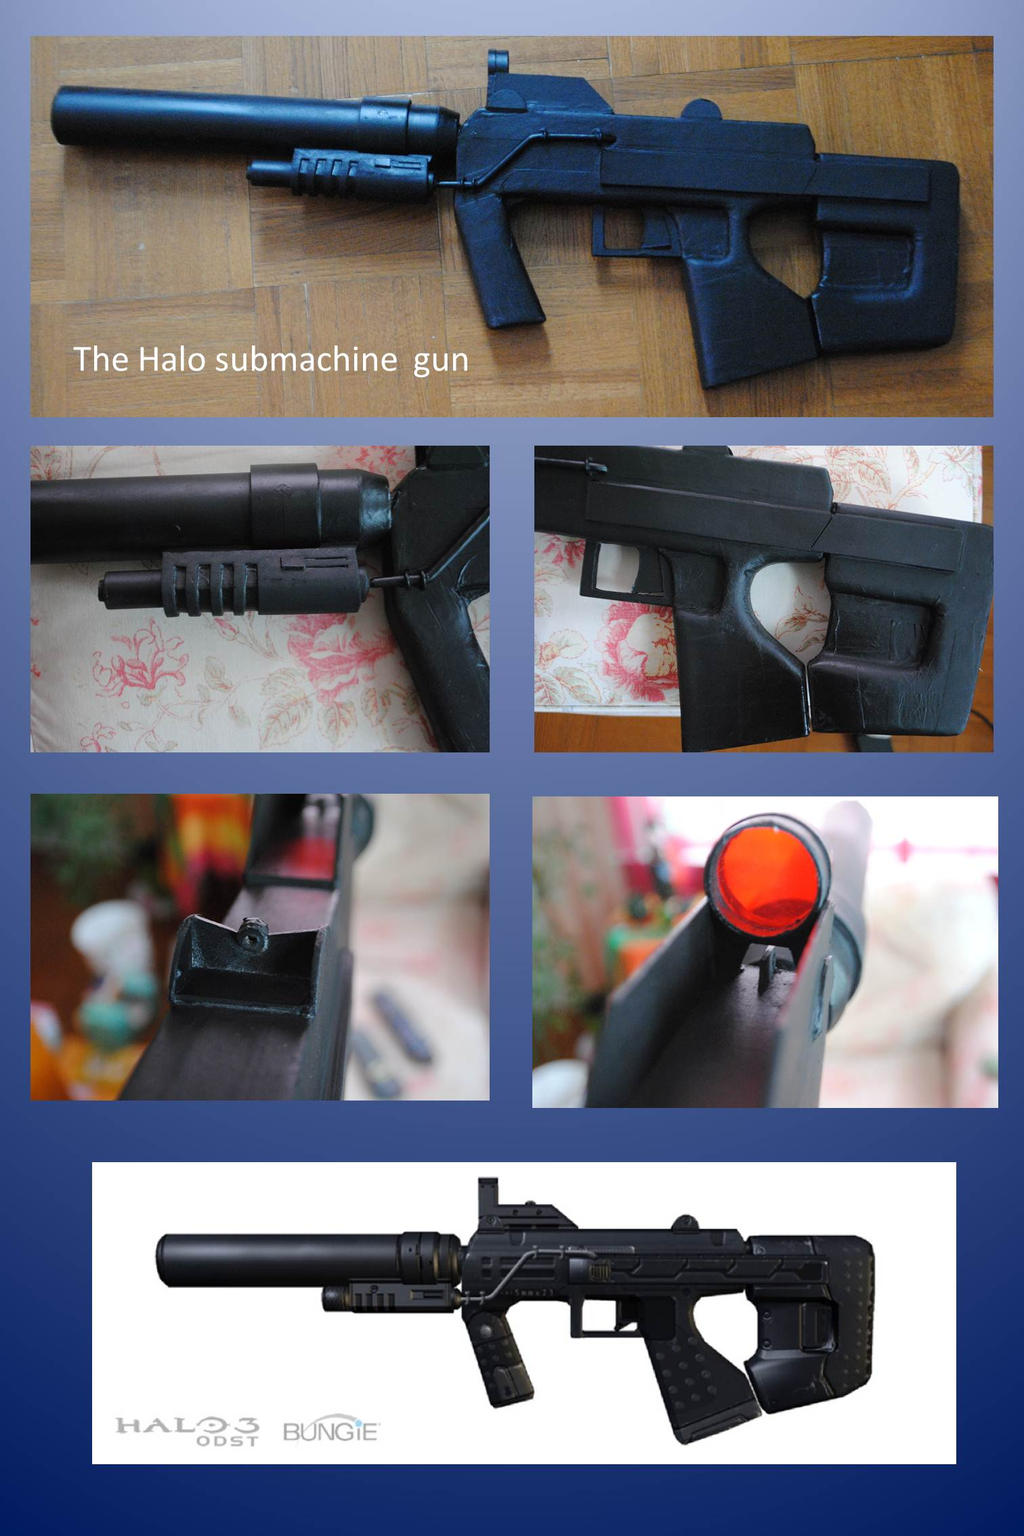 Halo M-7 Submachine gun by fixinman